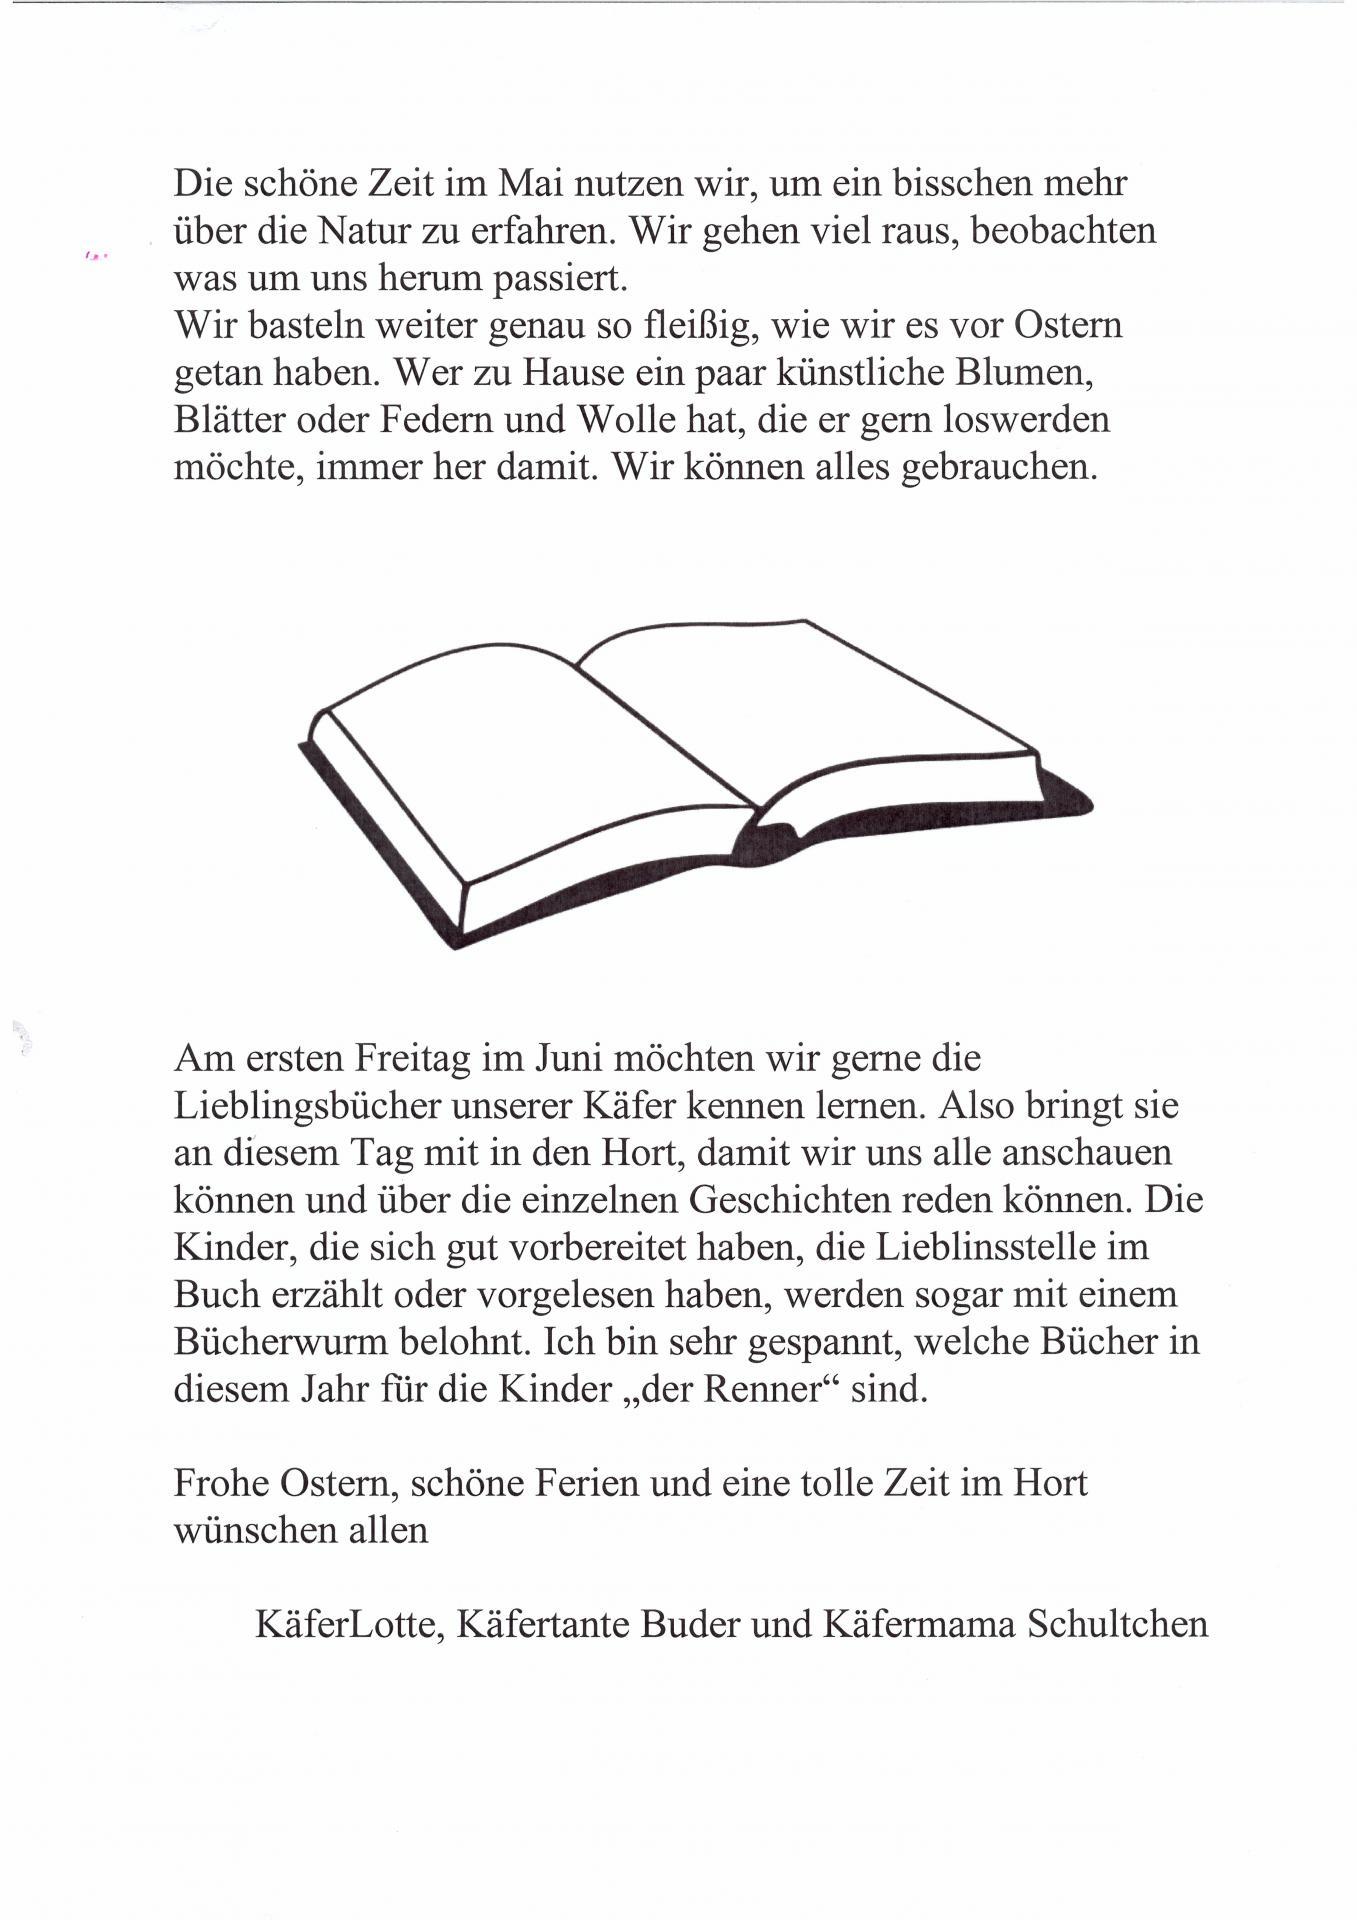 lipablatt märz 2021 Käfer -2-